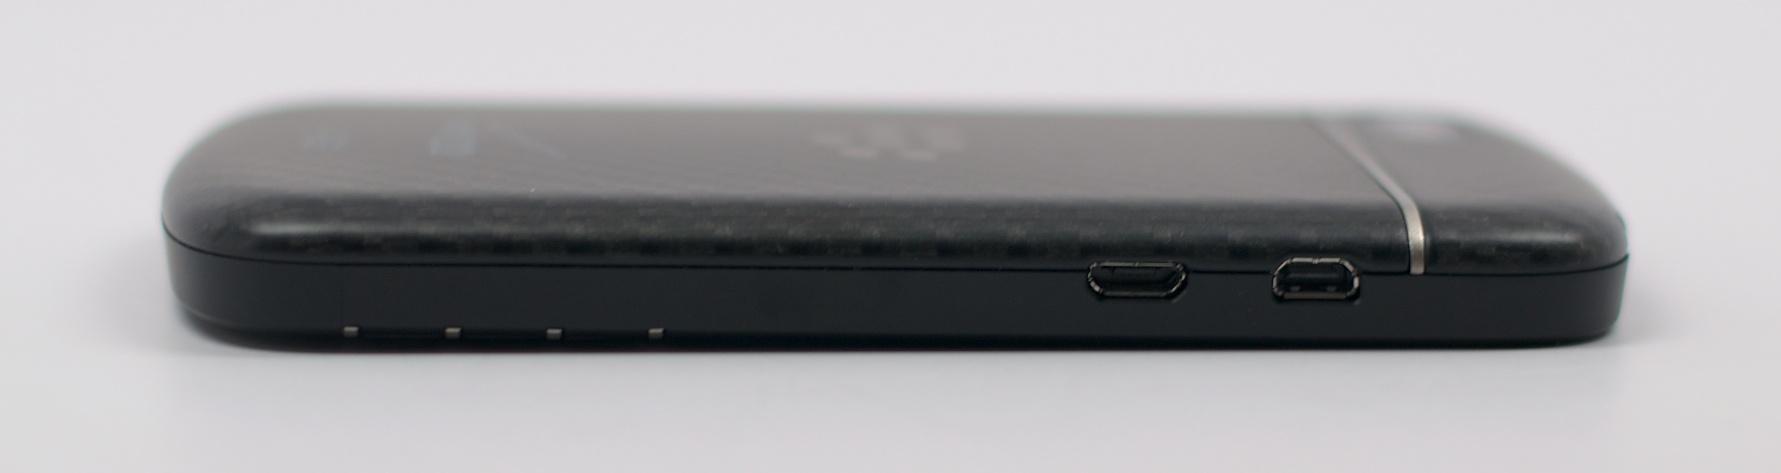 BlackBerry Q10 Review –  004